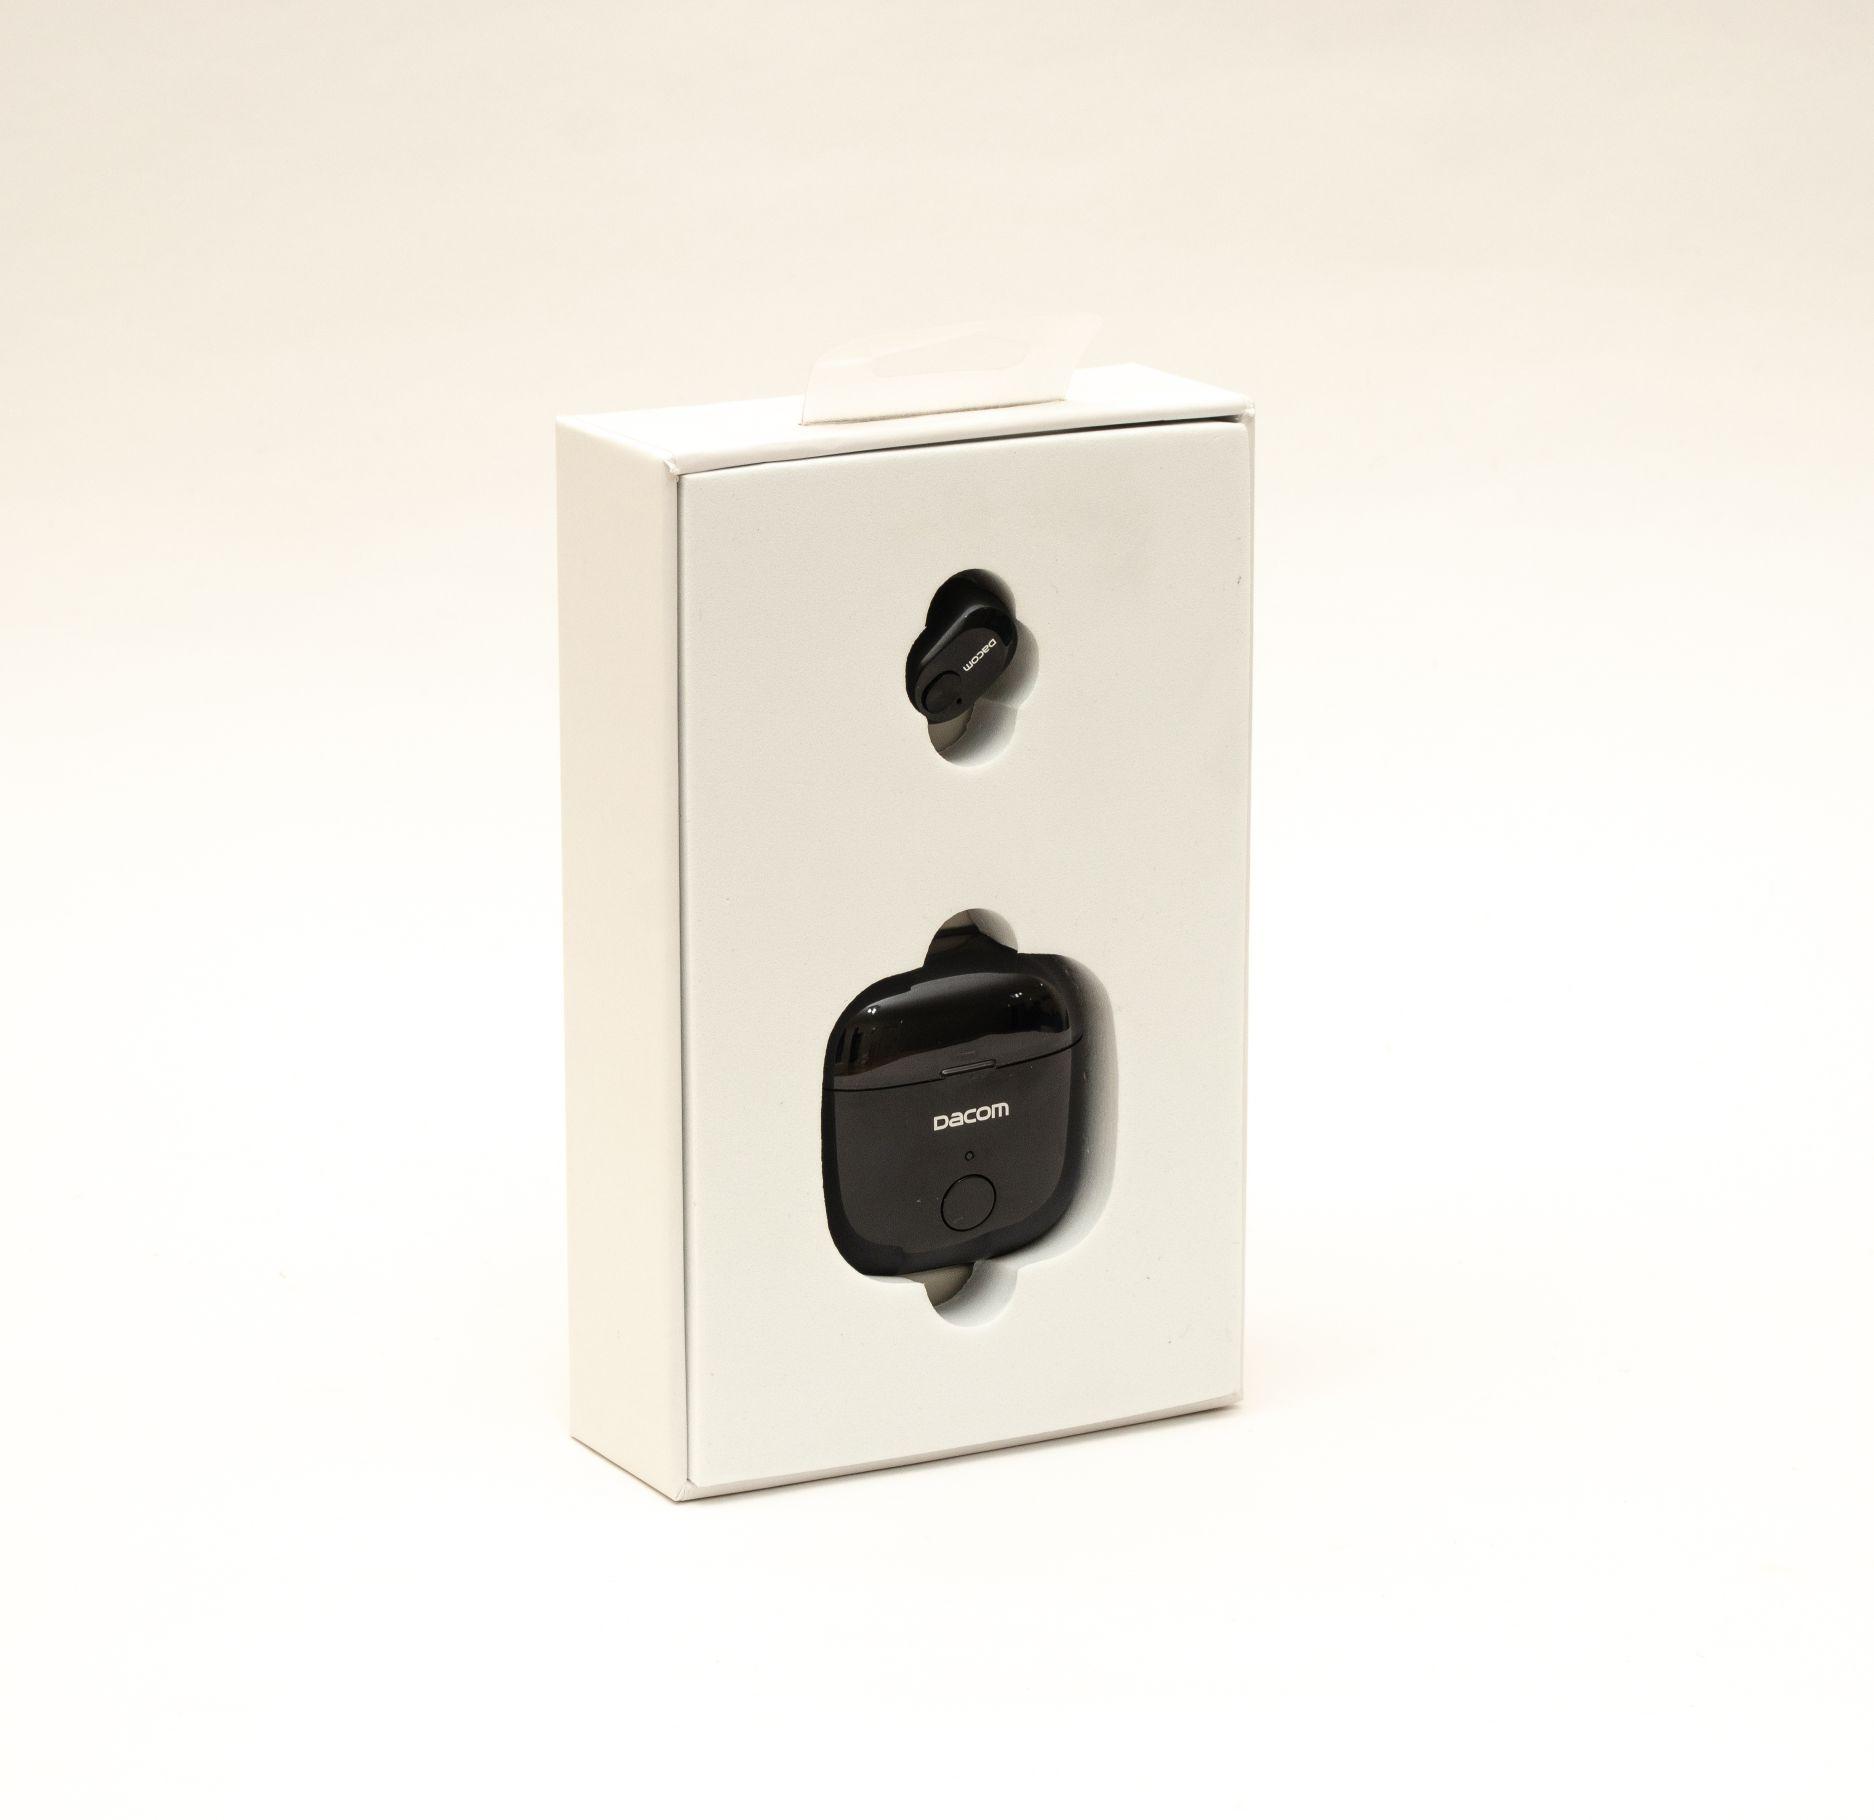 Earbuds Dacom K6p One Ear Black بسعر 520ج بدل من 675ج Phone Accessories Phone Accessories